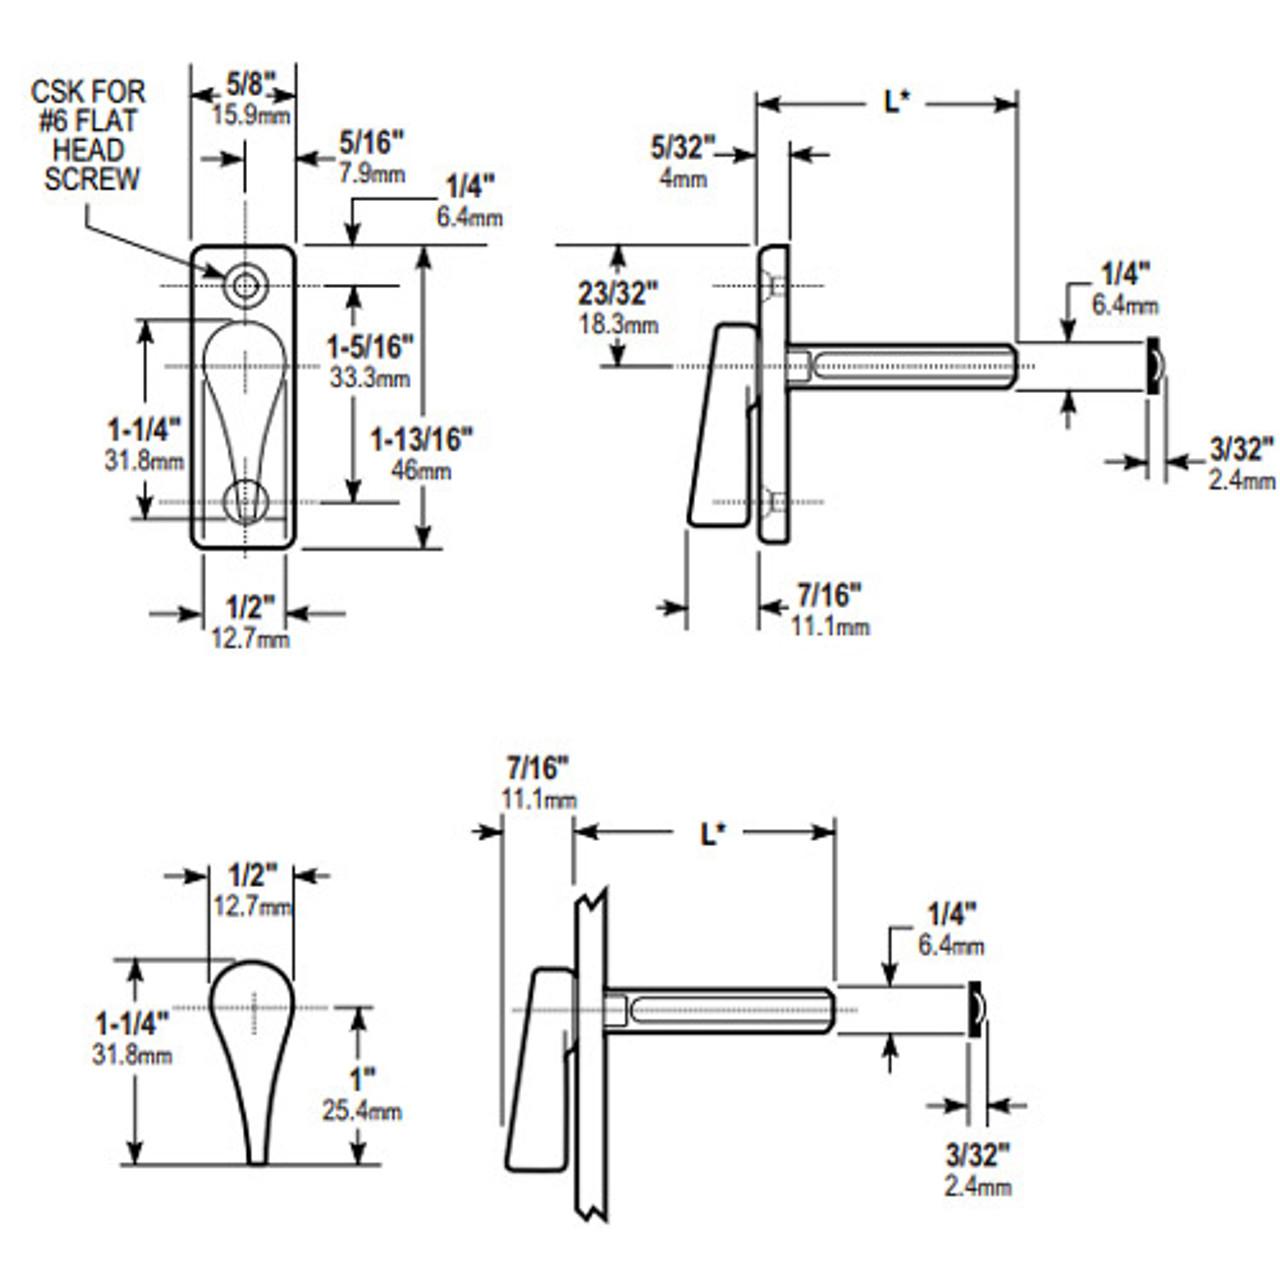 1000-02-18-119 Adams Rite 1000 Series Turns Dimensional View